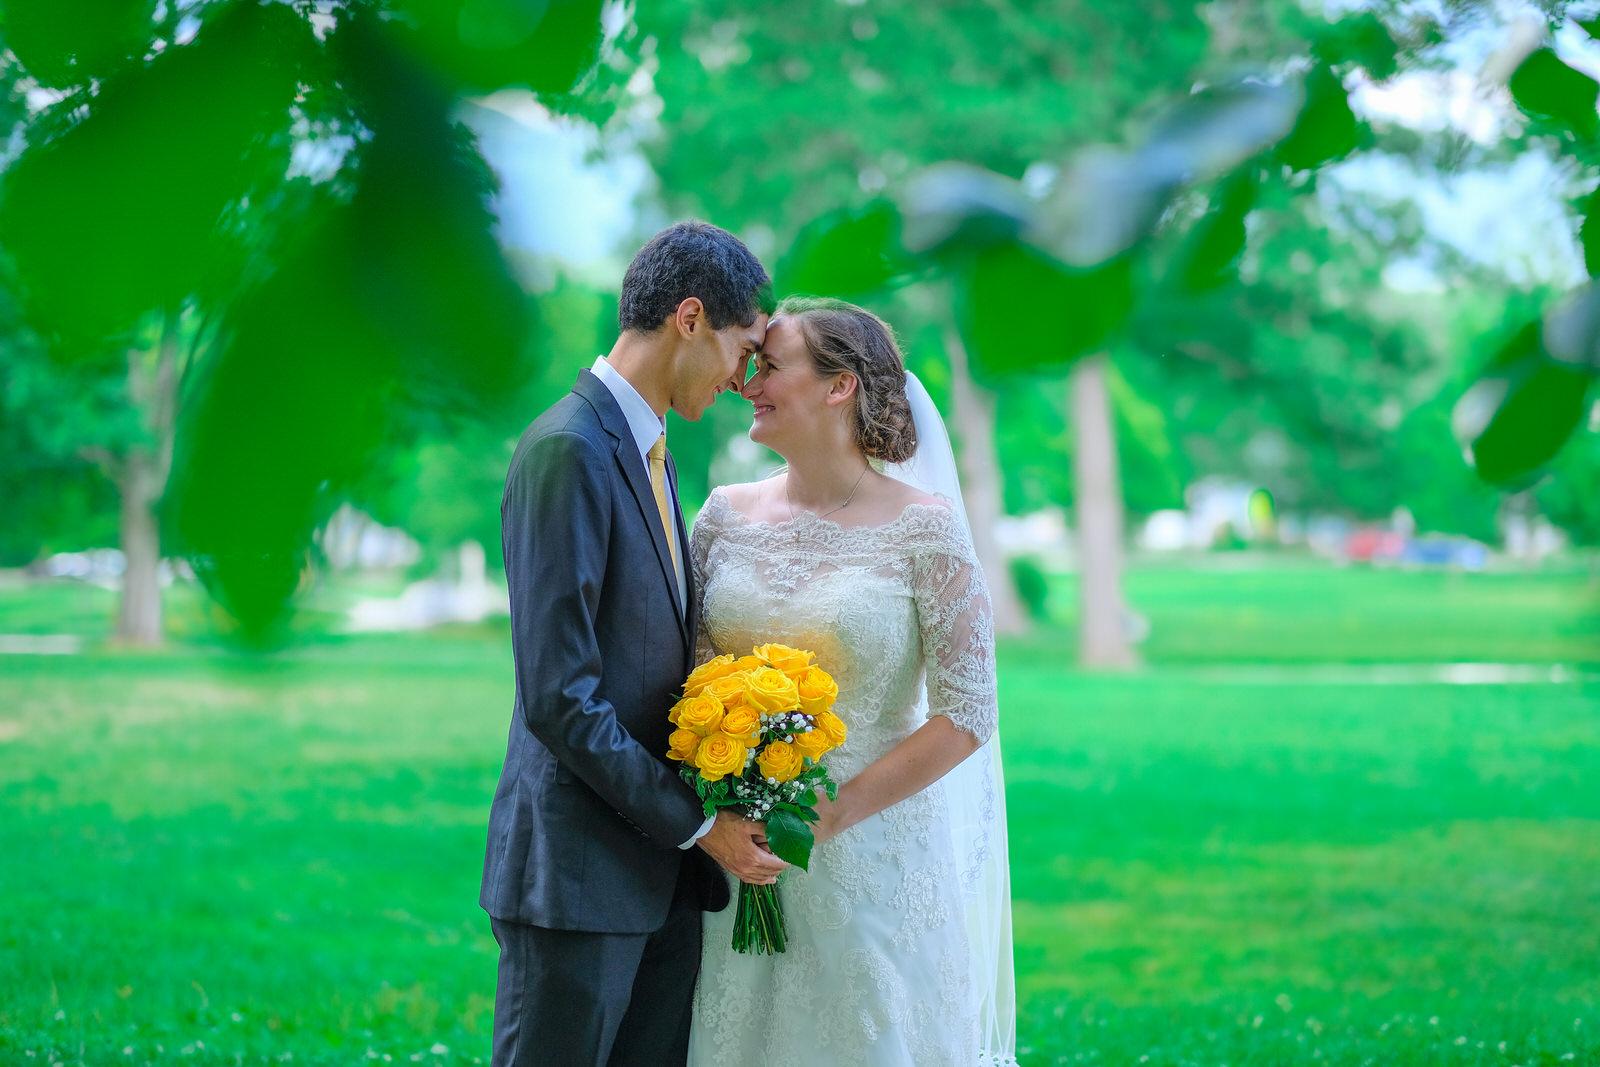 candid-vermont-wedding-photography-910.jpg